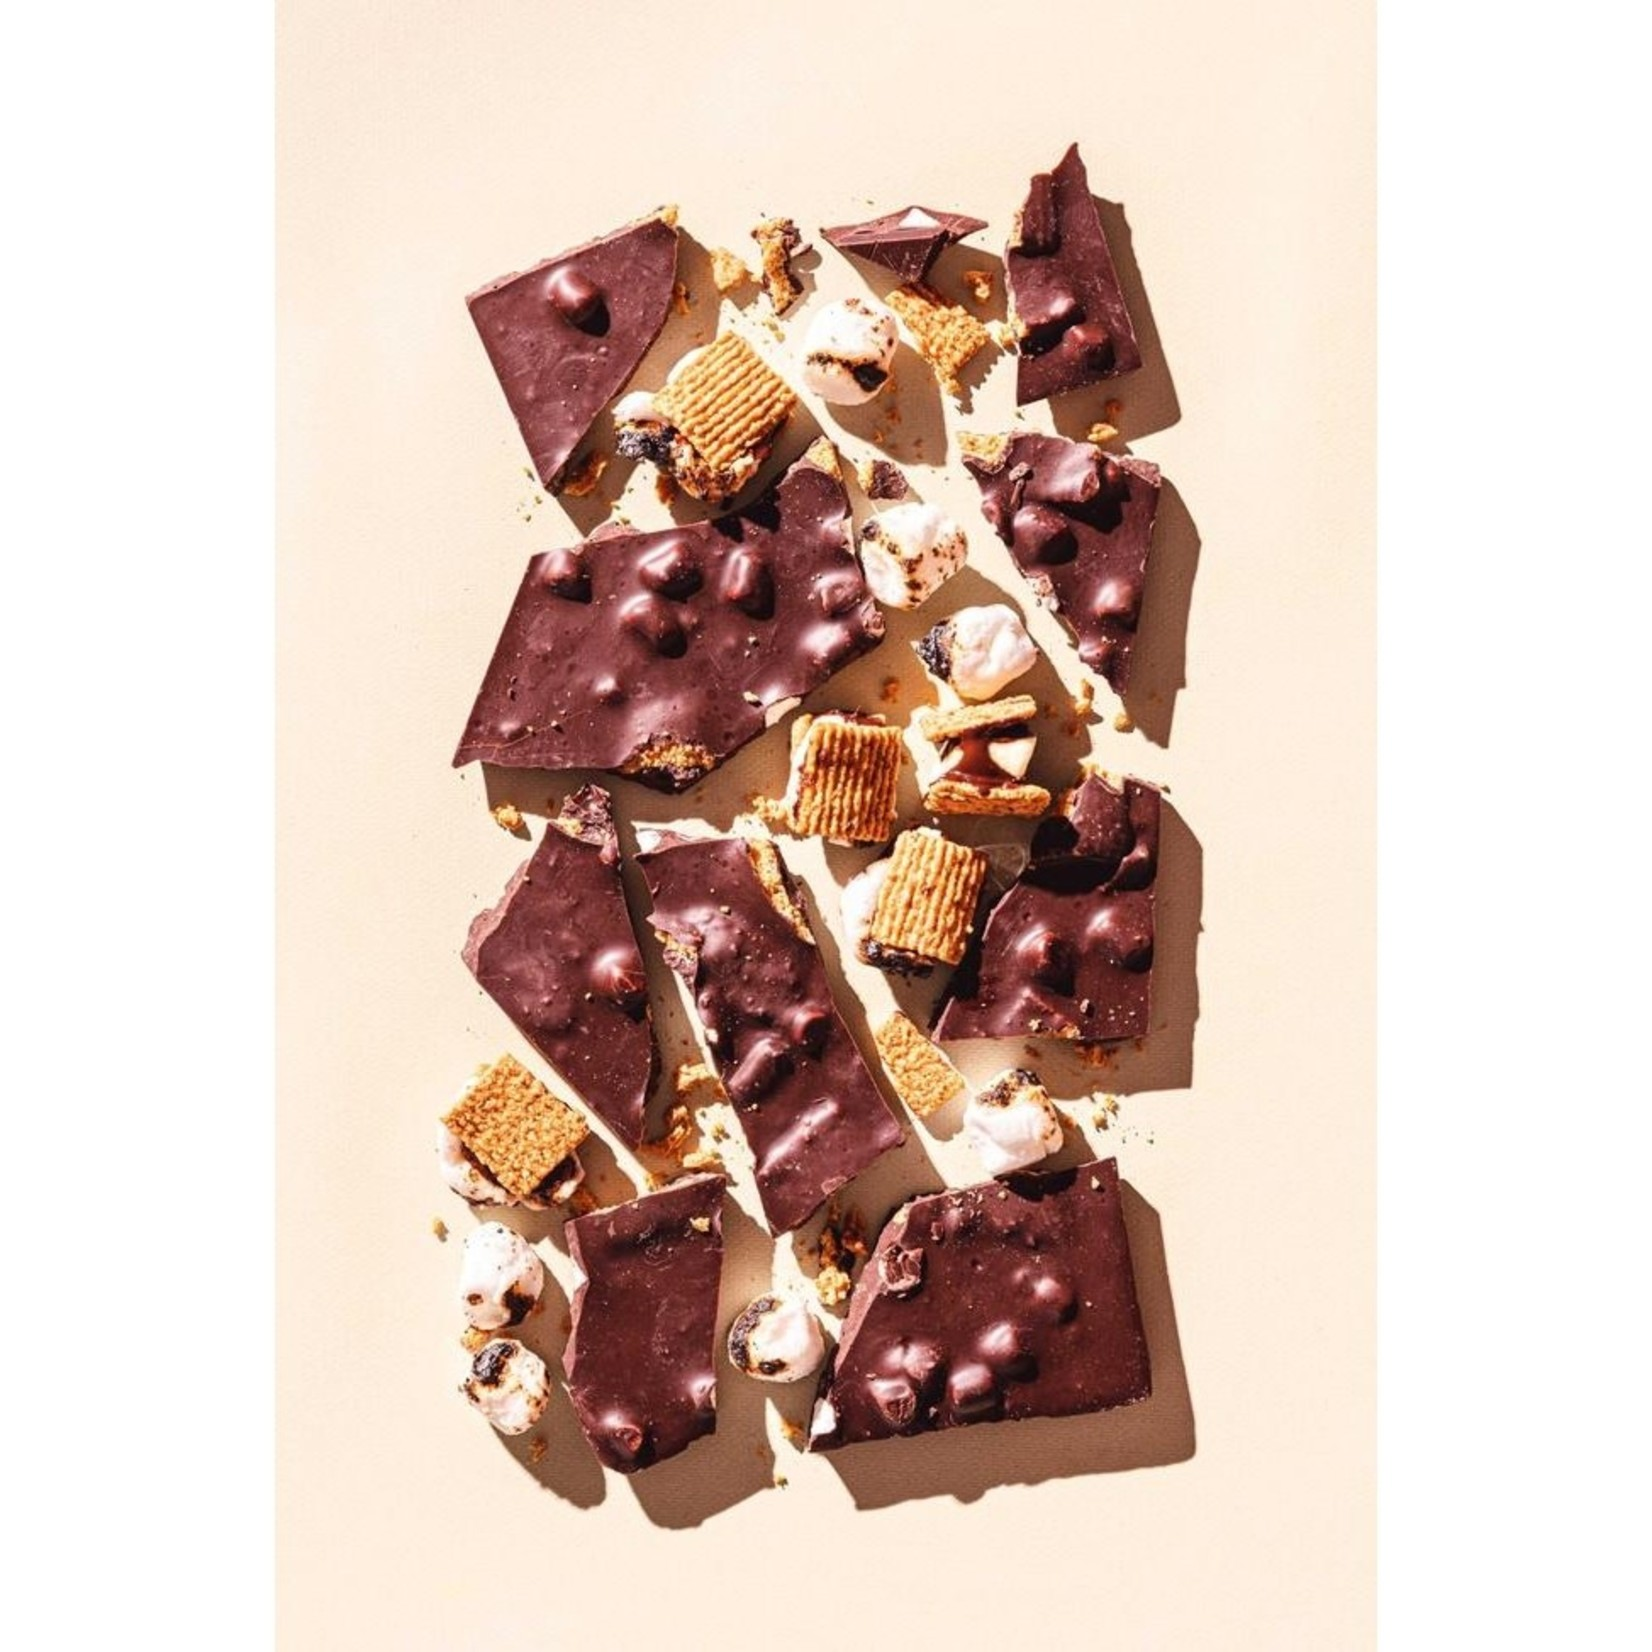 Compartes Chocolate Compartes Campfire S'Mores Chocolate Bar